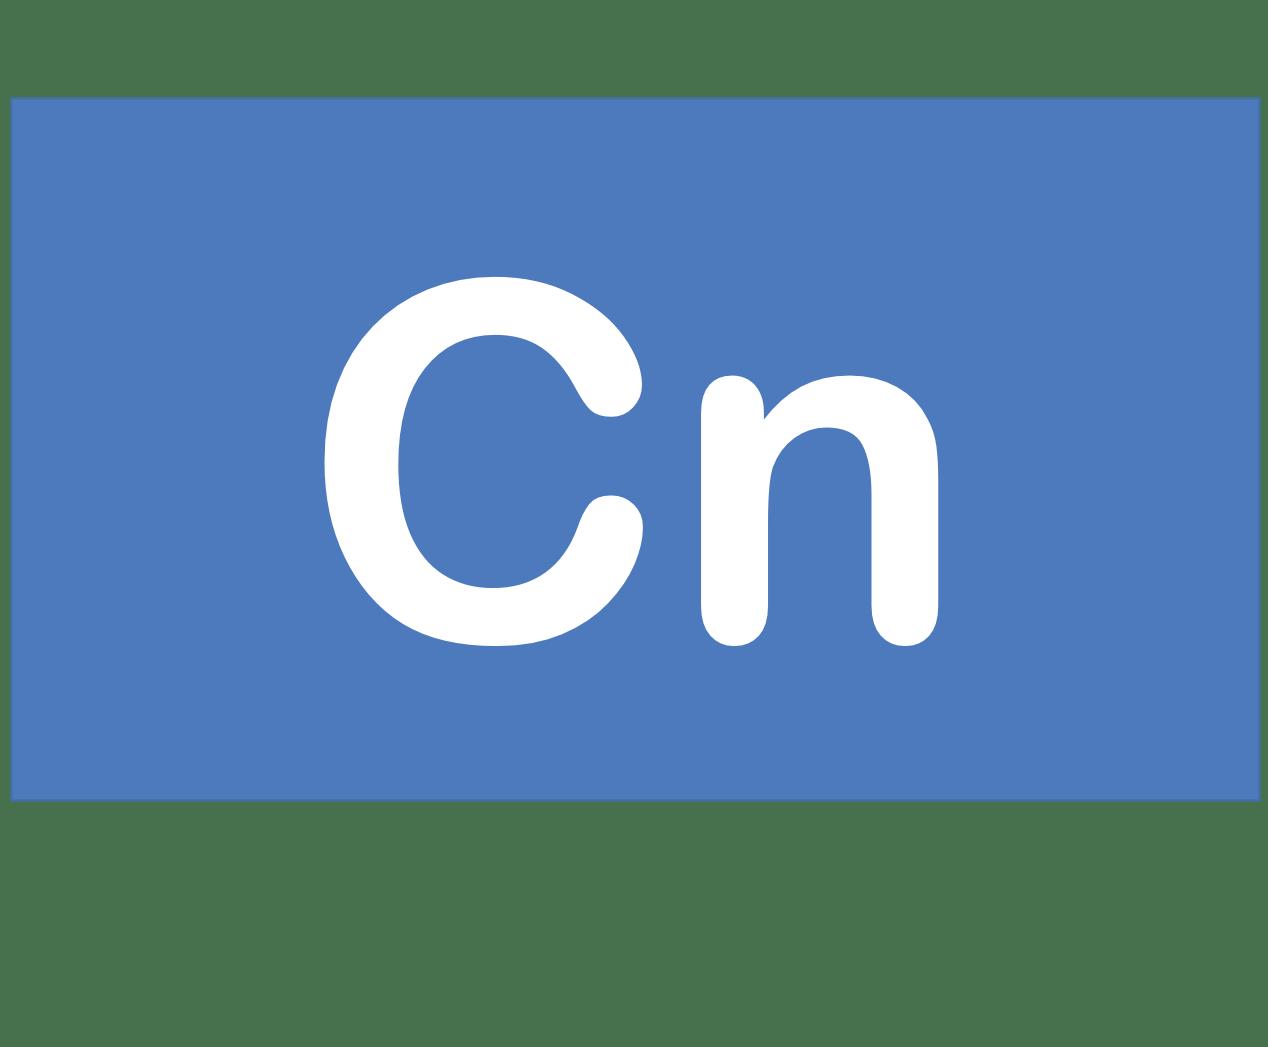 112 Cn コペルニシウム Copernicium 元素 記号 周期表 化学 原子